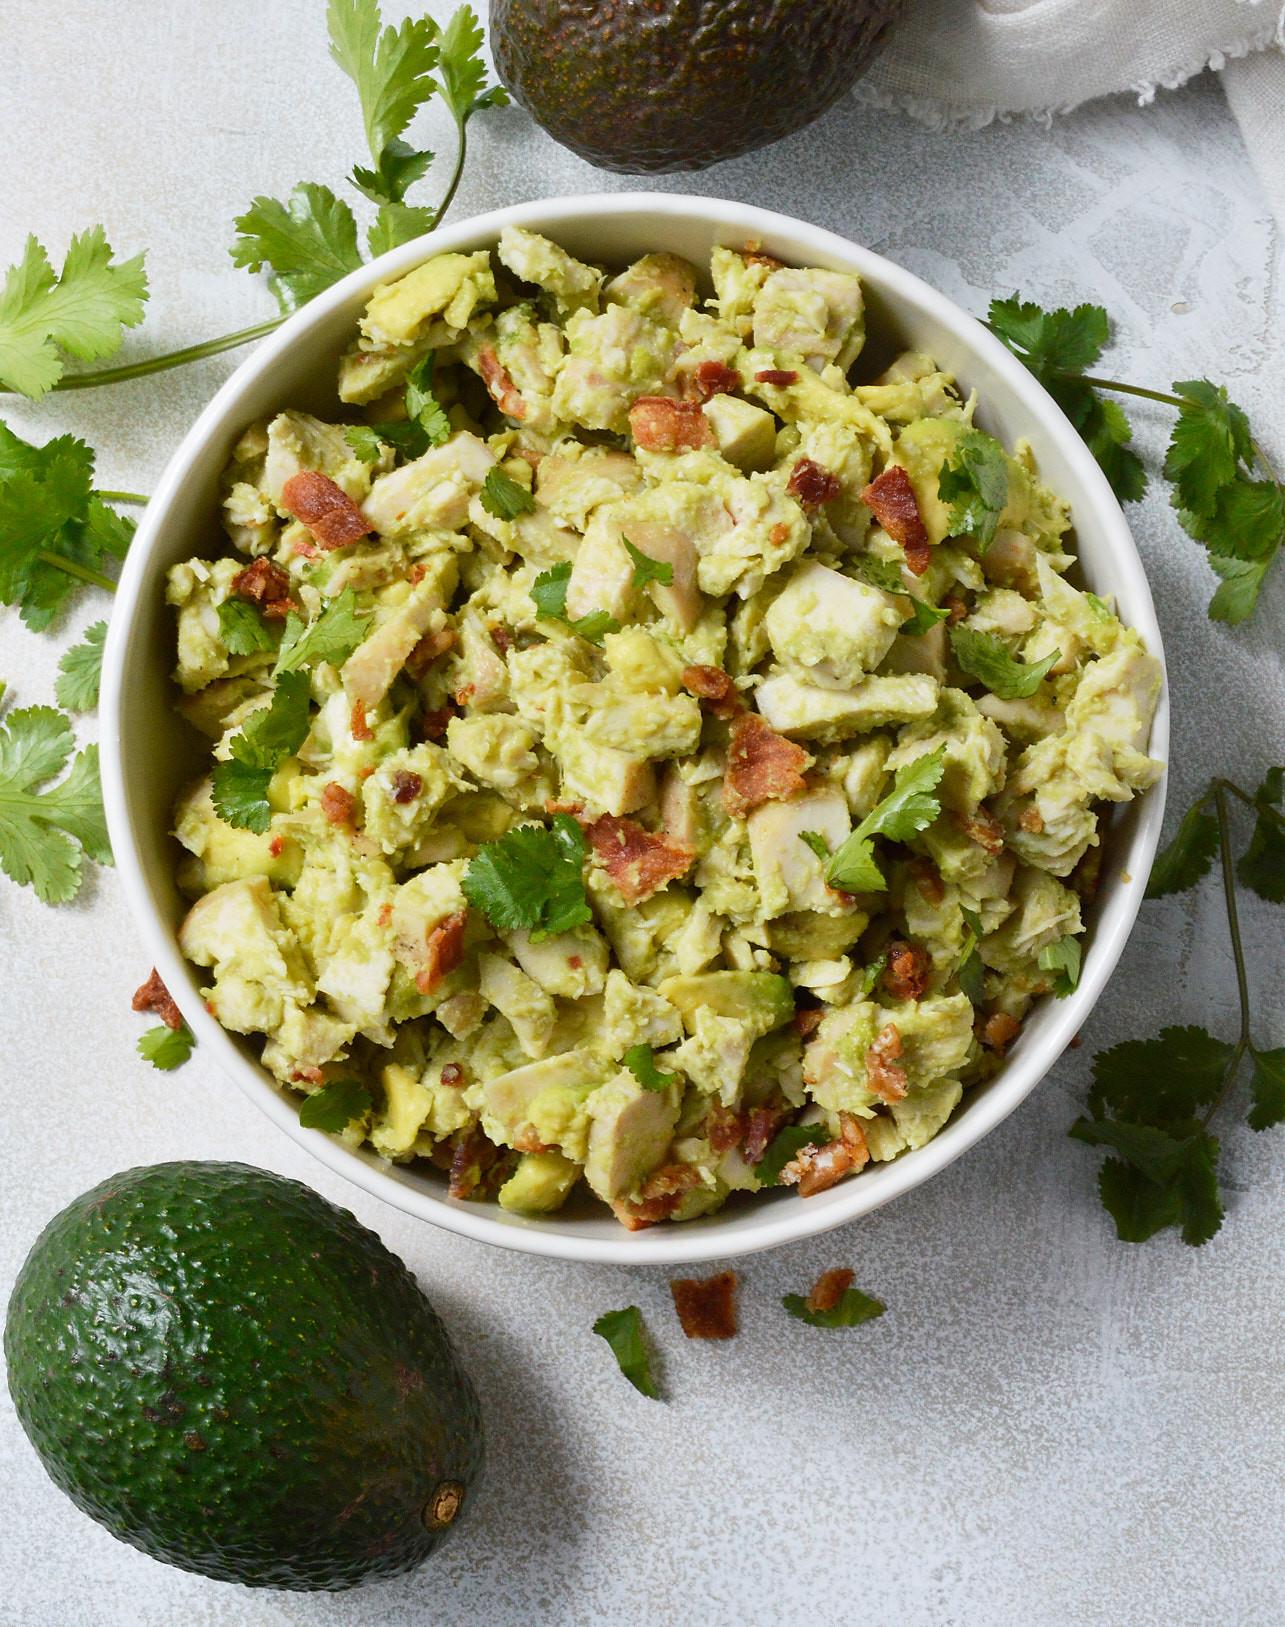 Chicken Salad Recipe Healthy  Bacon Avocado Chicken Salad Whole30 Recipe WonkyWonderful